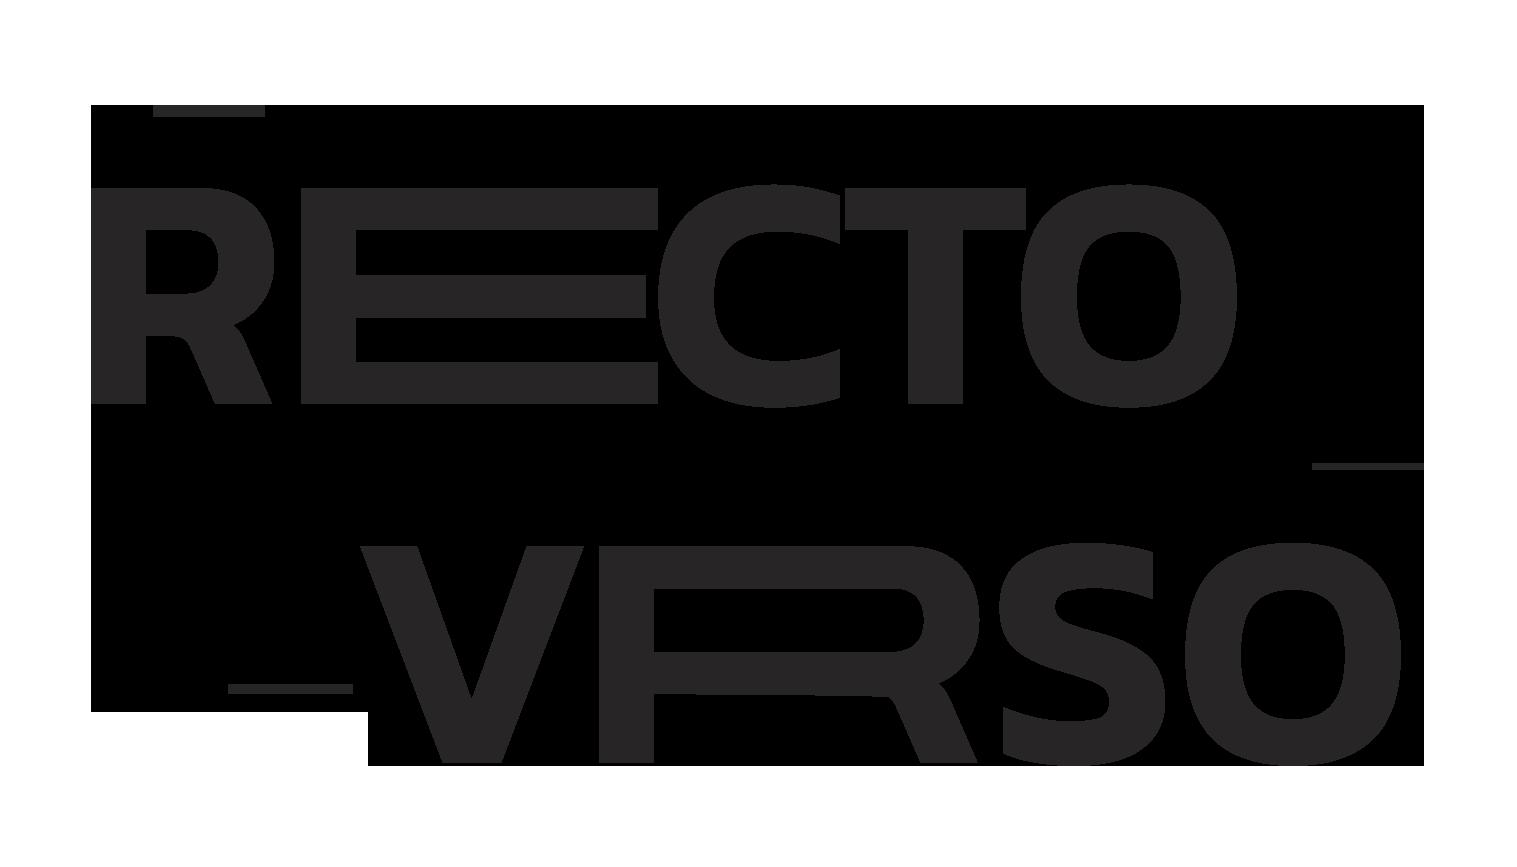 Recto_VRso_2019_Logo_N